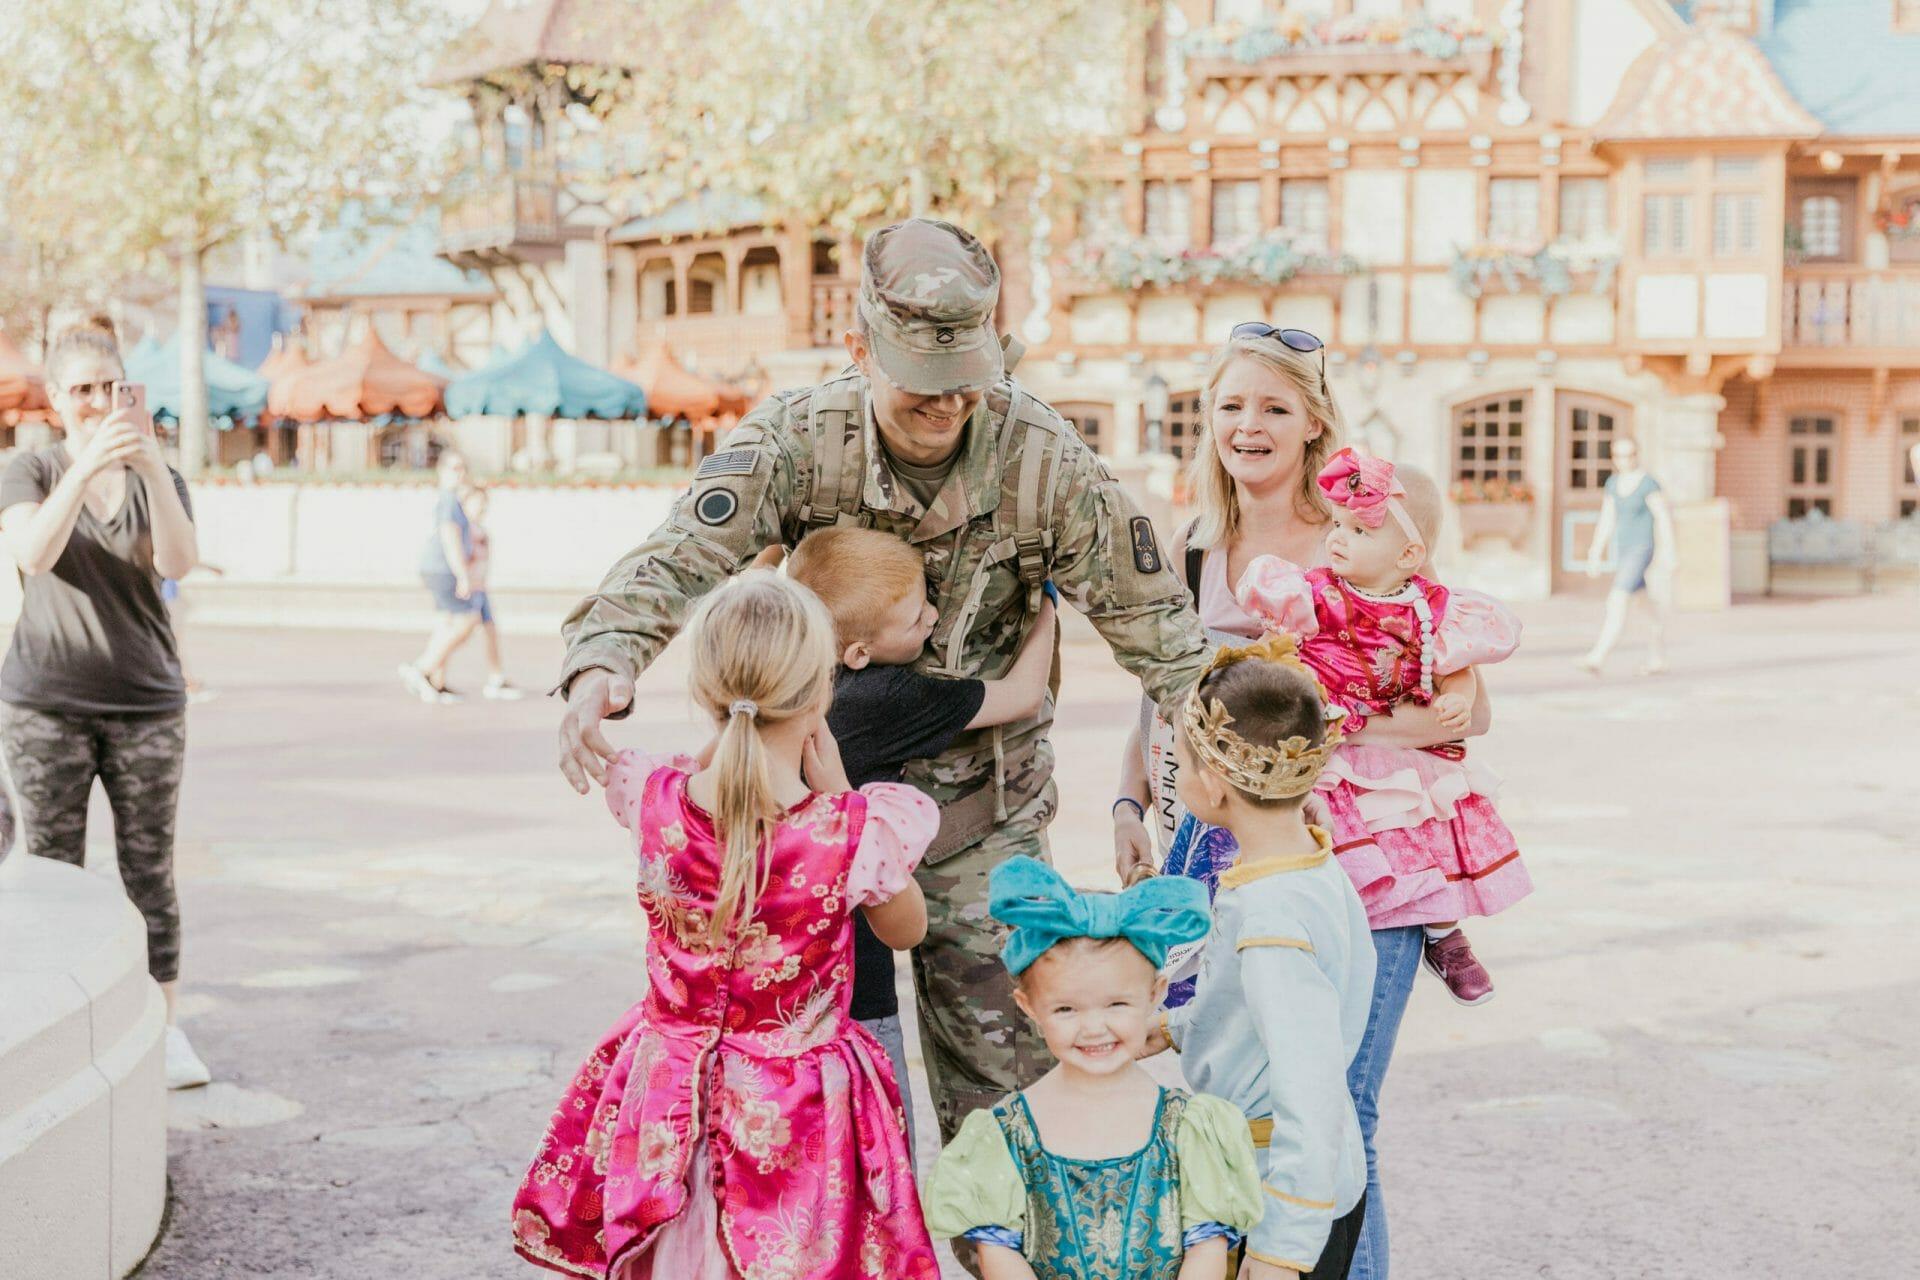 Military Dad Reunites With Family at Walt Disney World